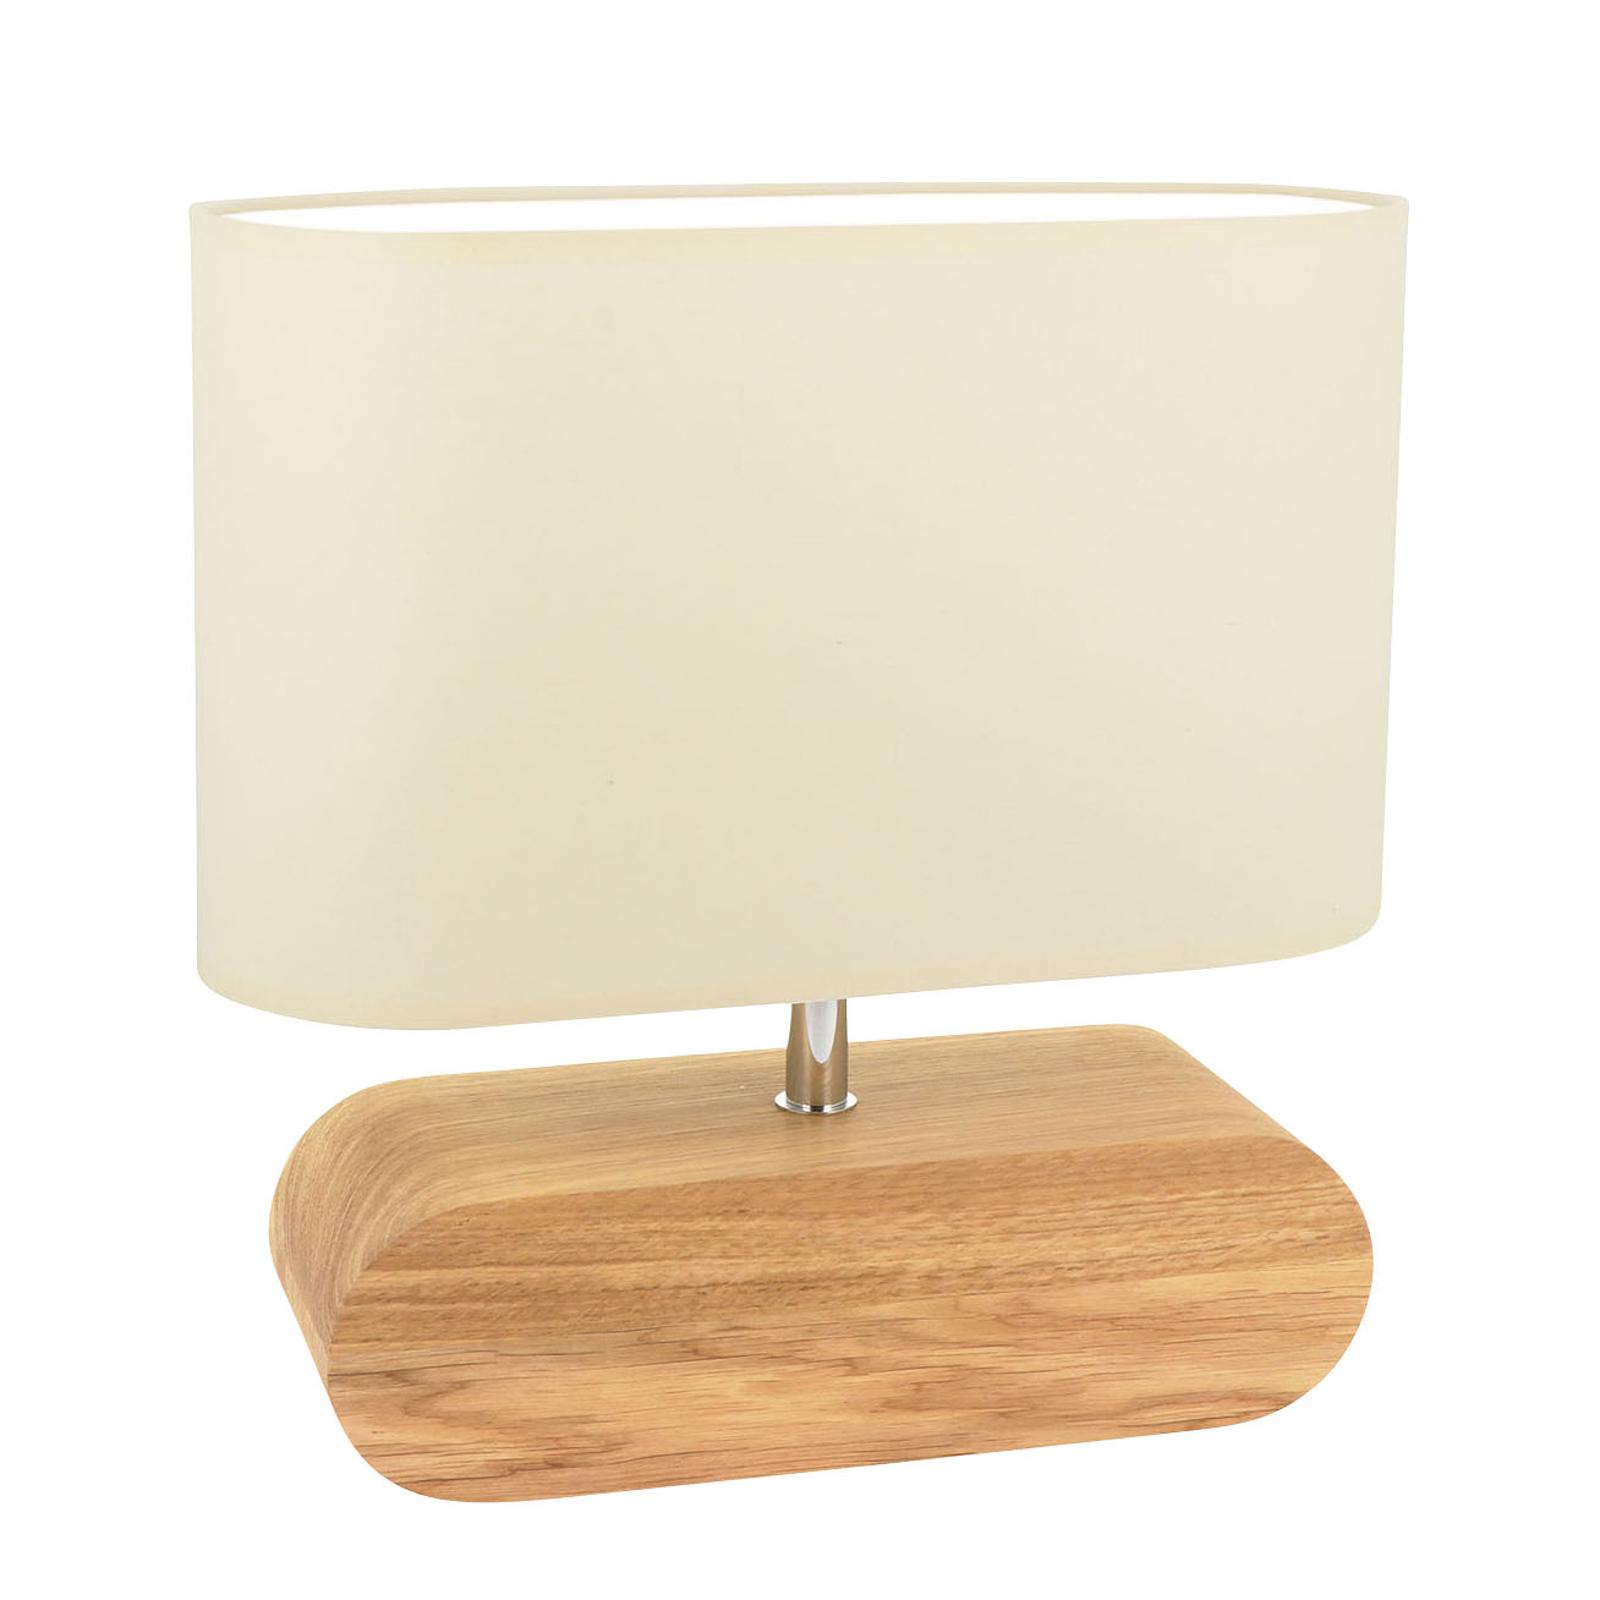 Tafellamp Marinna, voet eiken, kap ecru